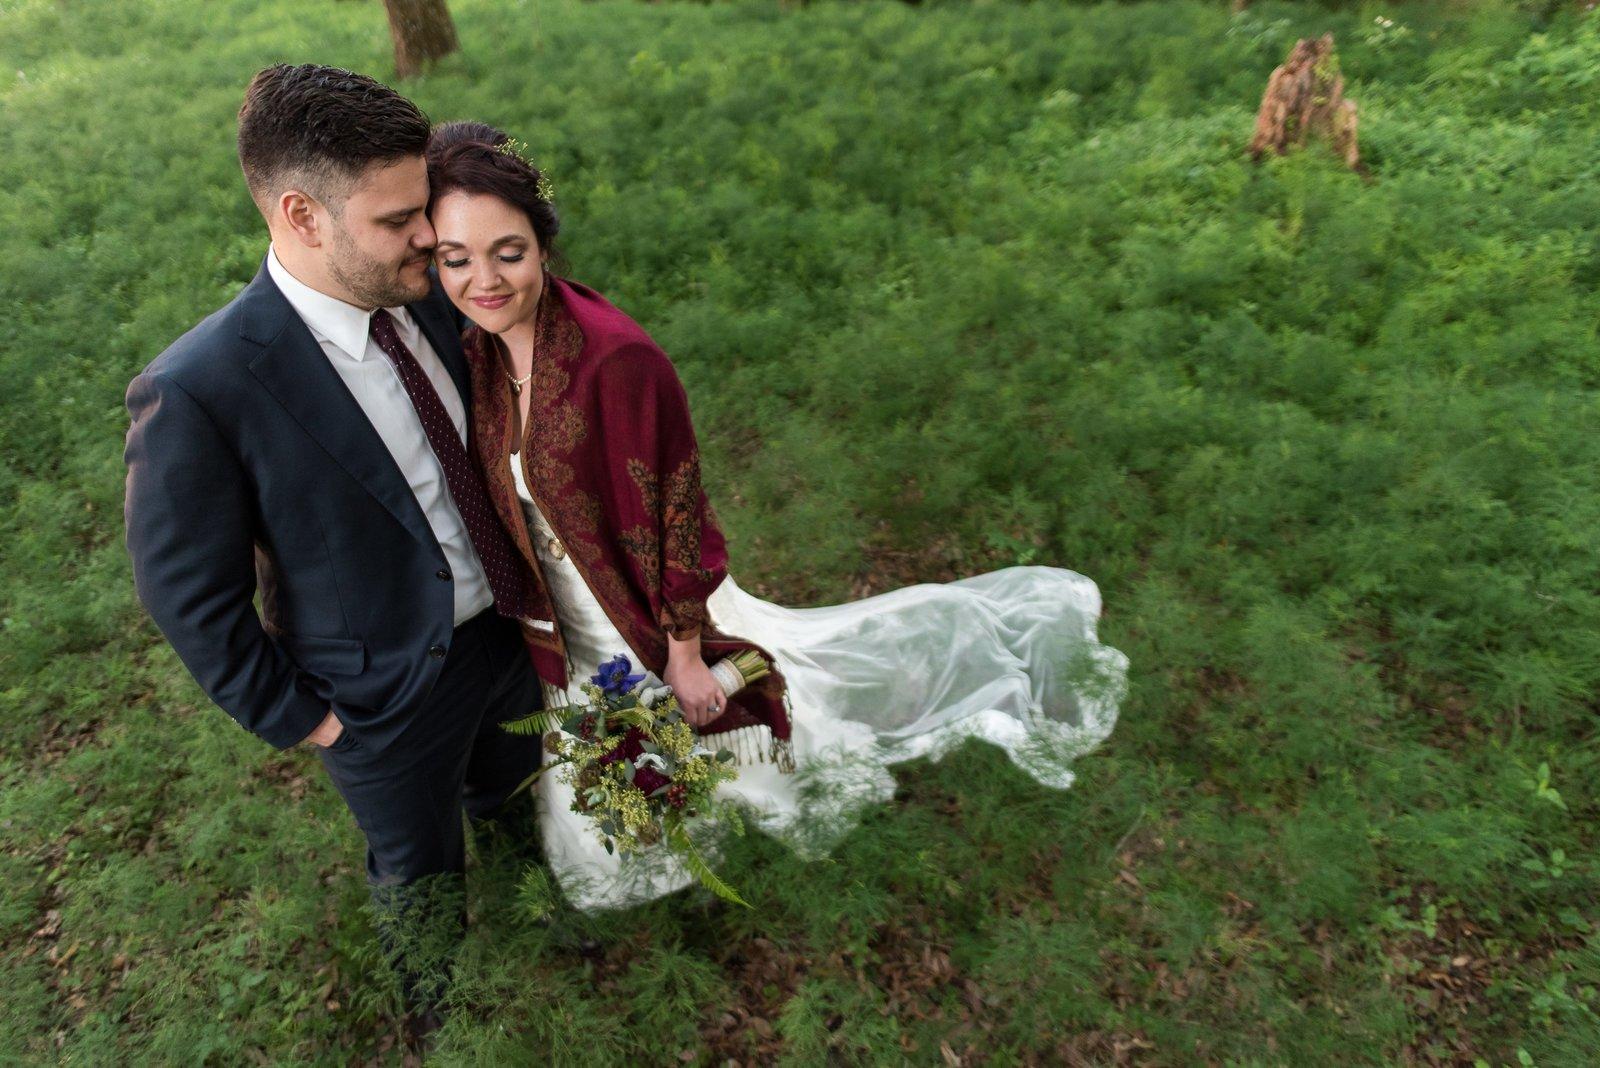 harmony-gardens-wedding-haley-and-william-1480